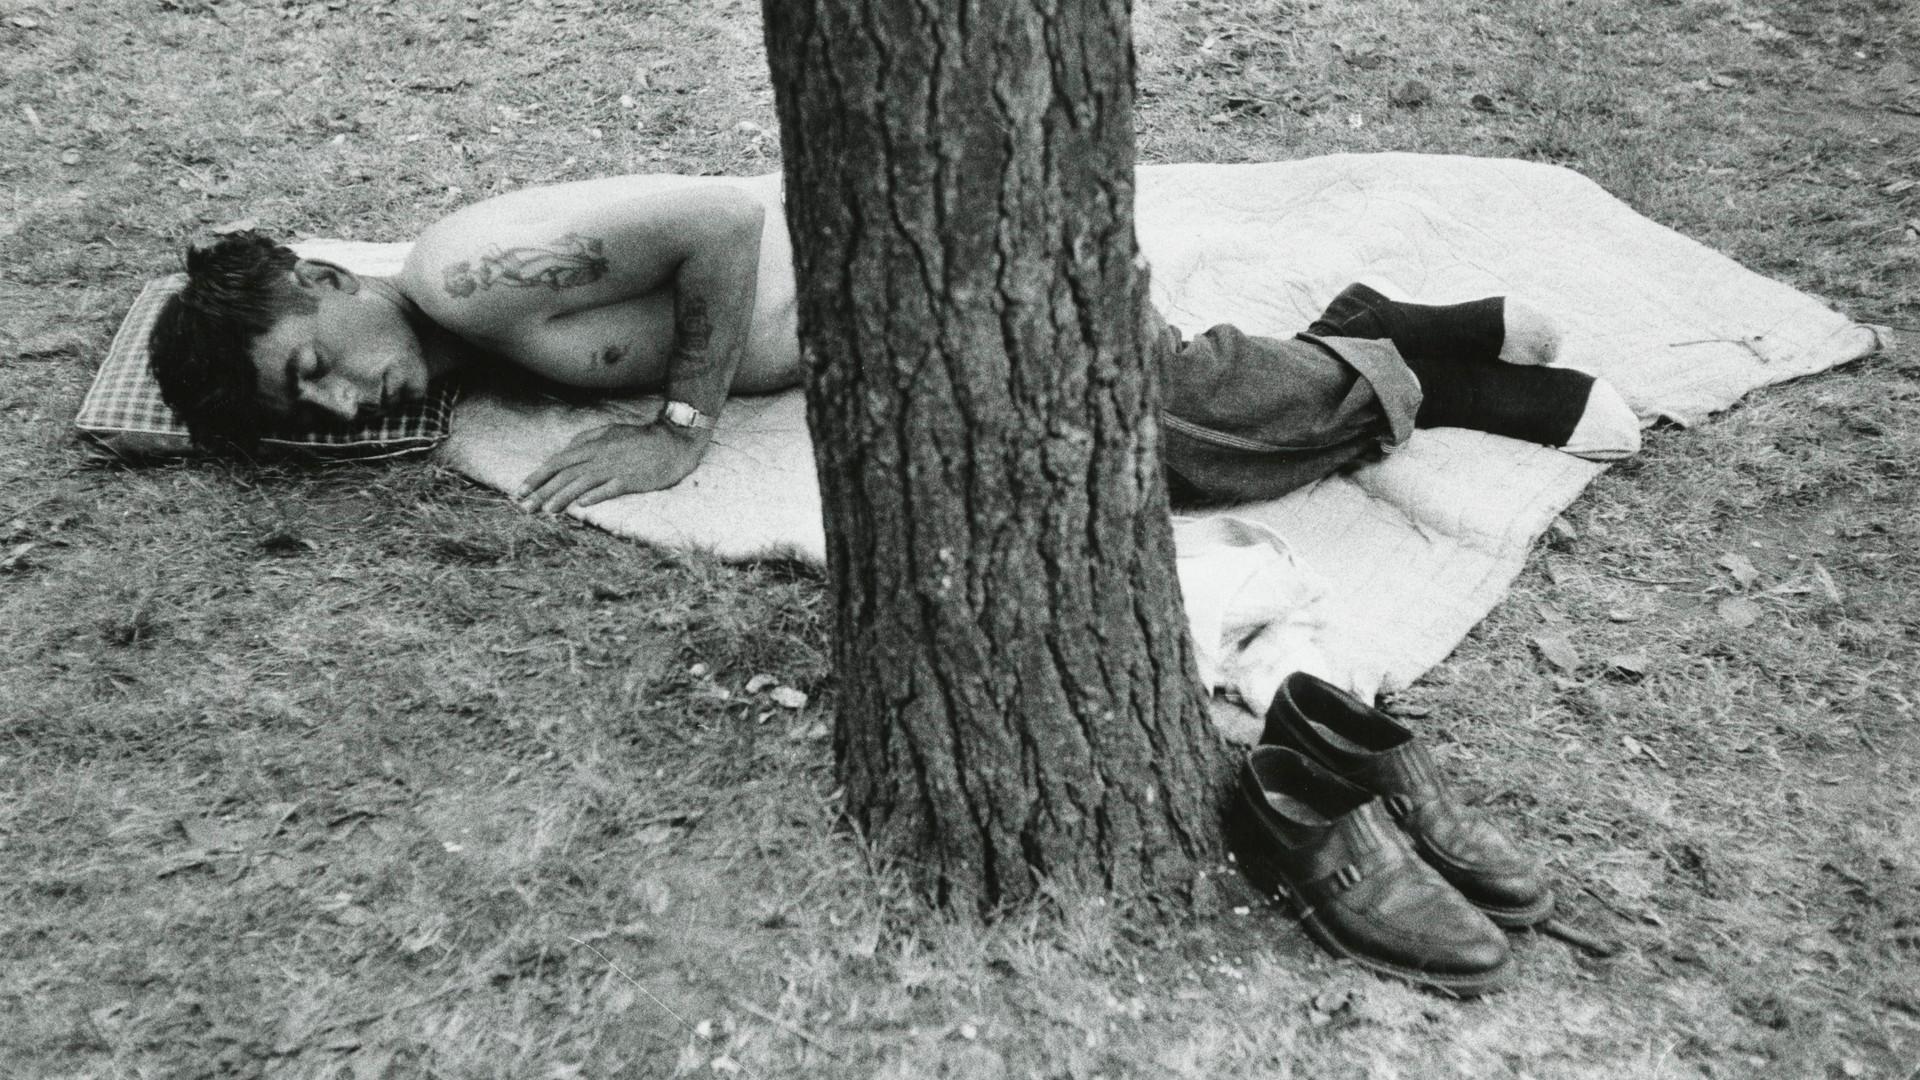 Robert Frank, Public park - Cleveland, Ohio, 1955